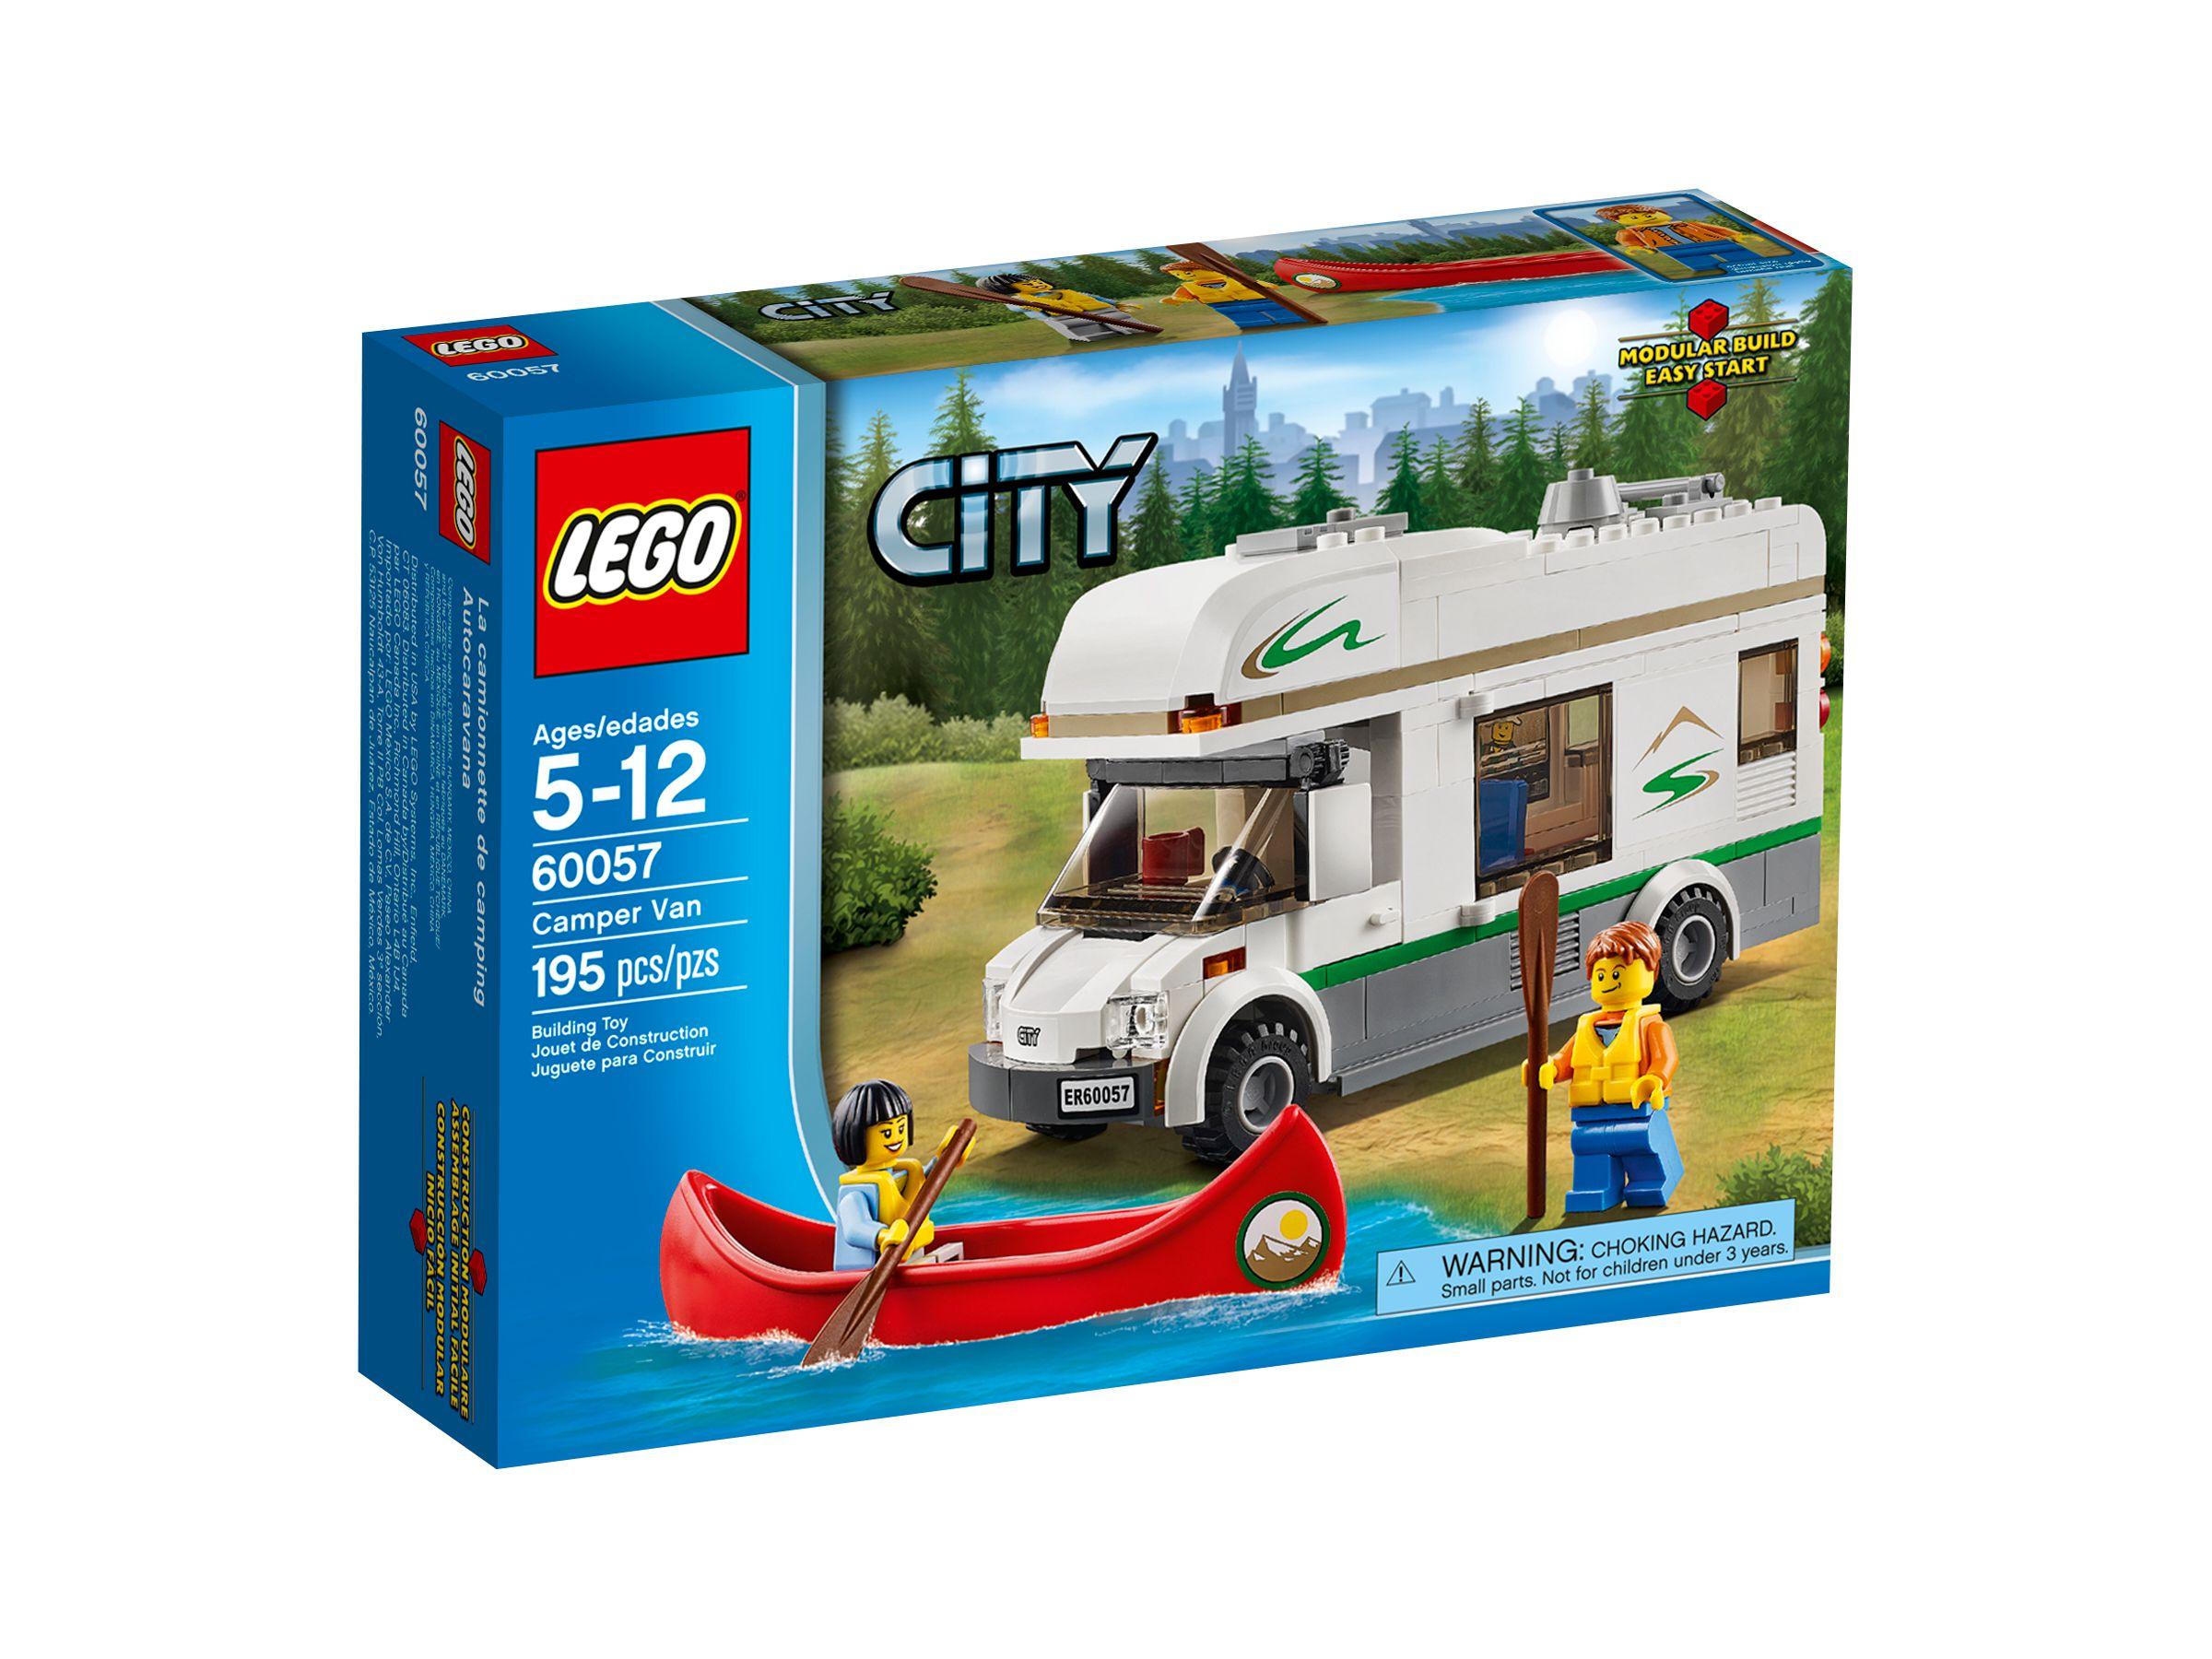 lego 60057 wohnmobil mit kanu city 2014 camper van brickmerge. Black Bedroom Furniture Sets. Home Design Ideas